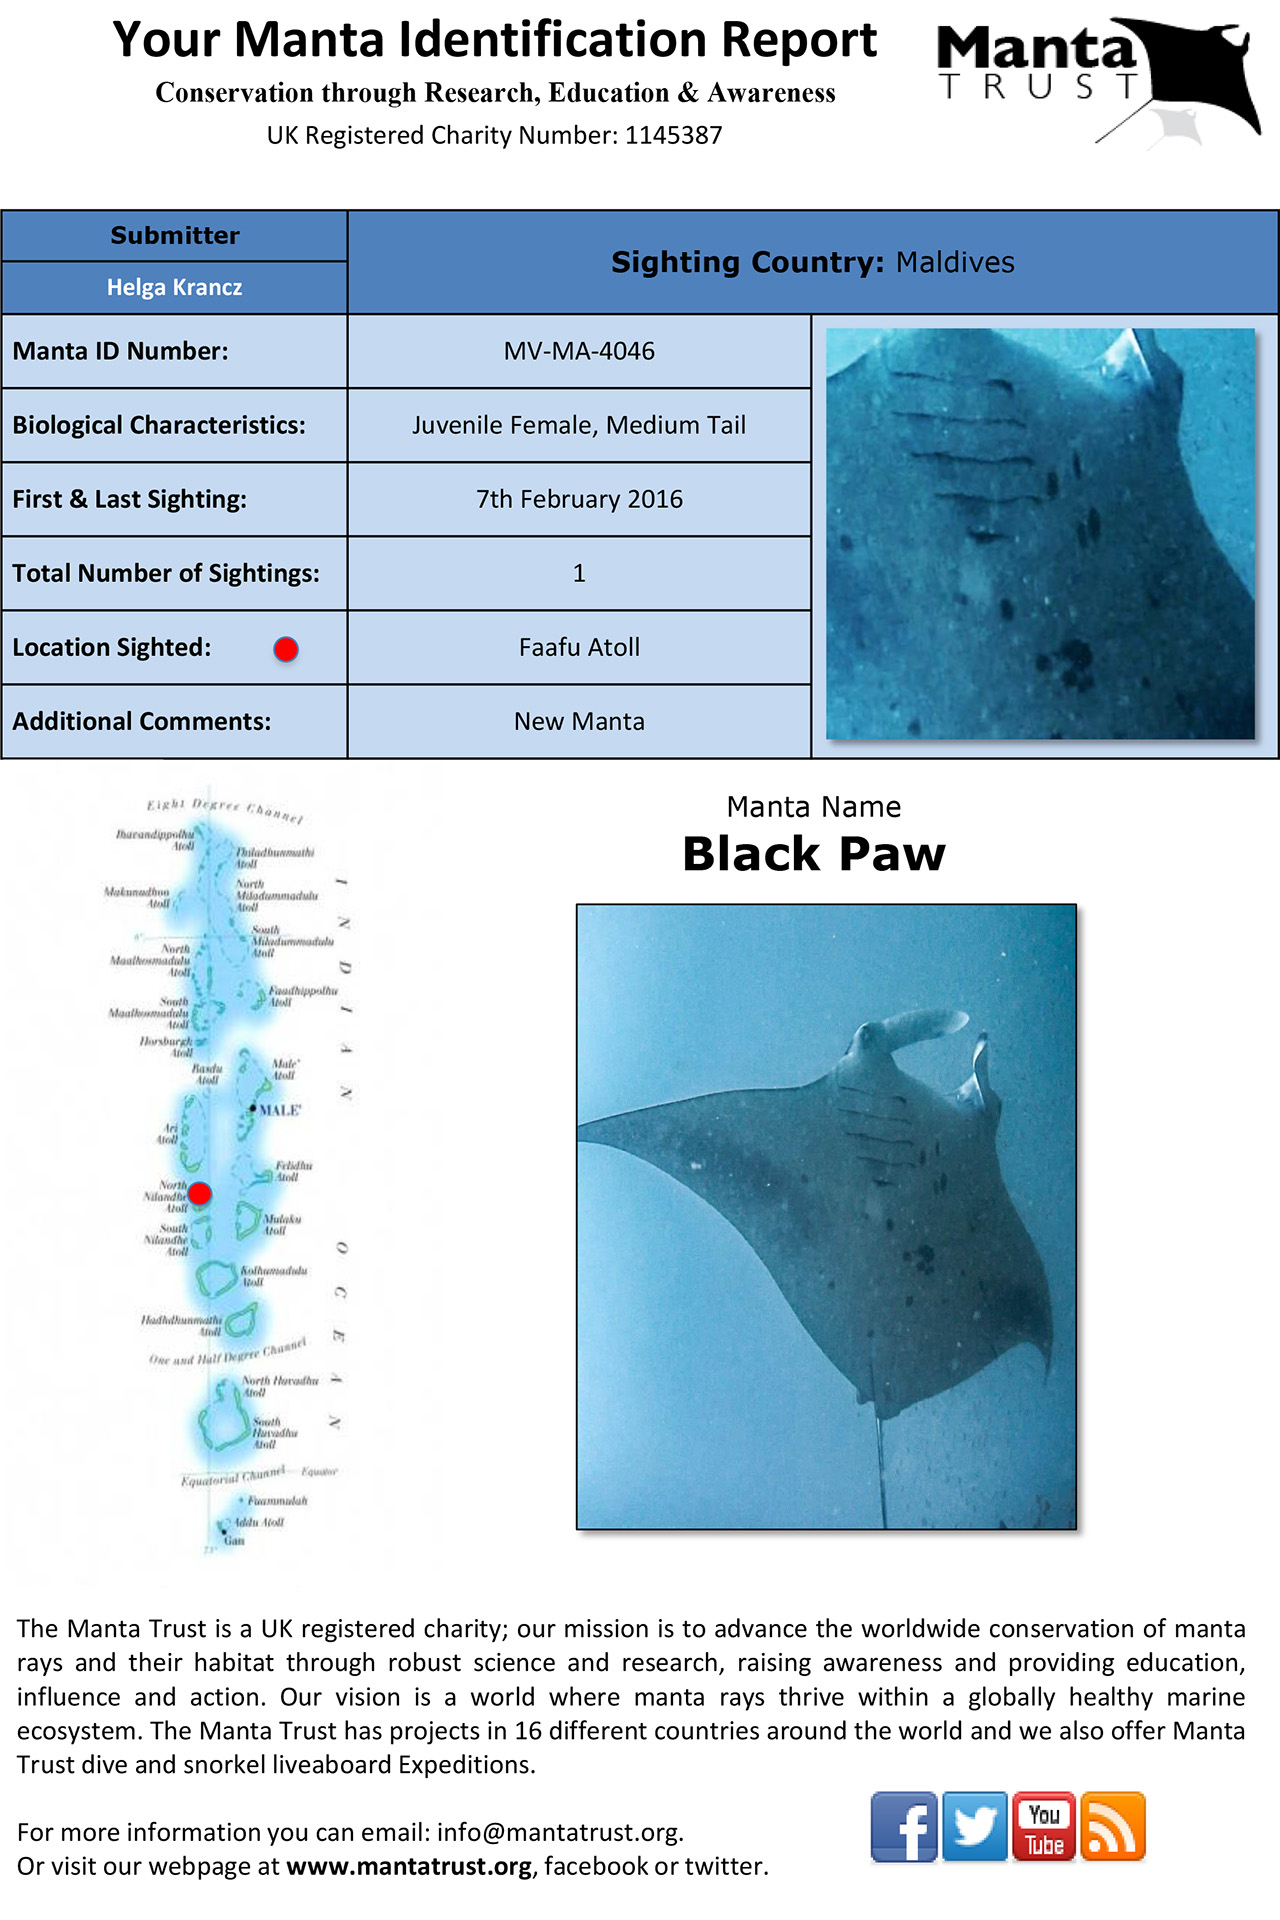 Black Paw - The Manta Trust